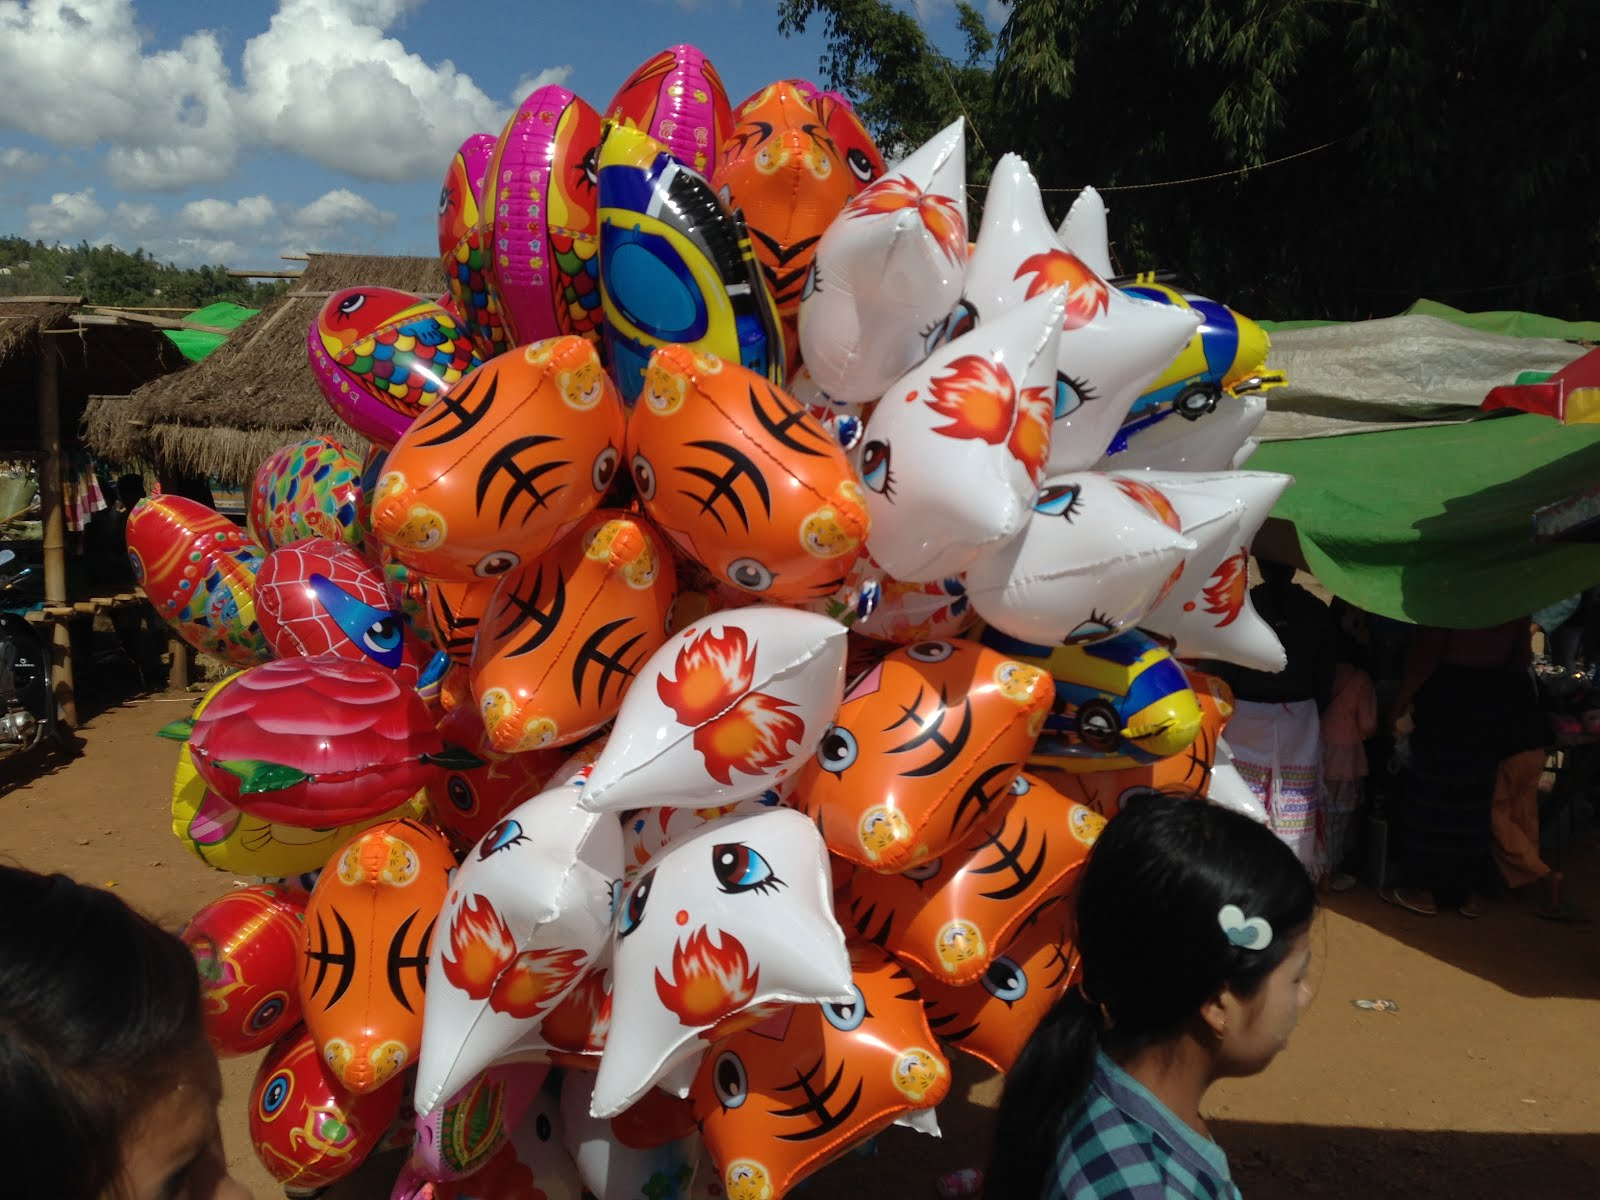 Heading to festival, Aungban